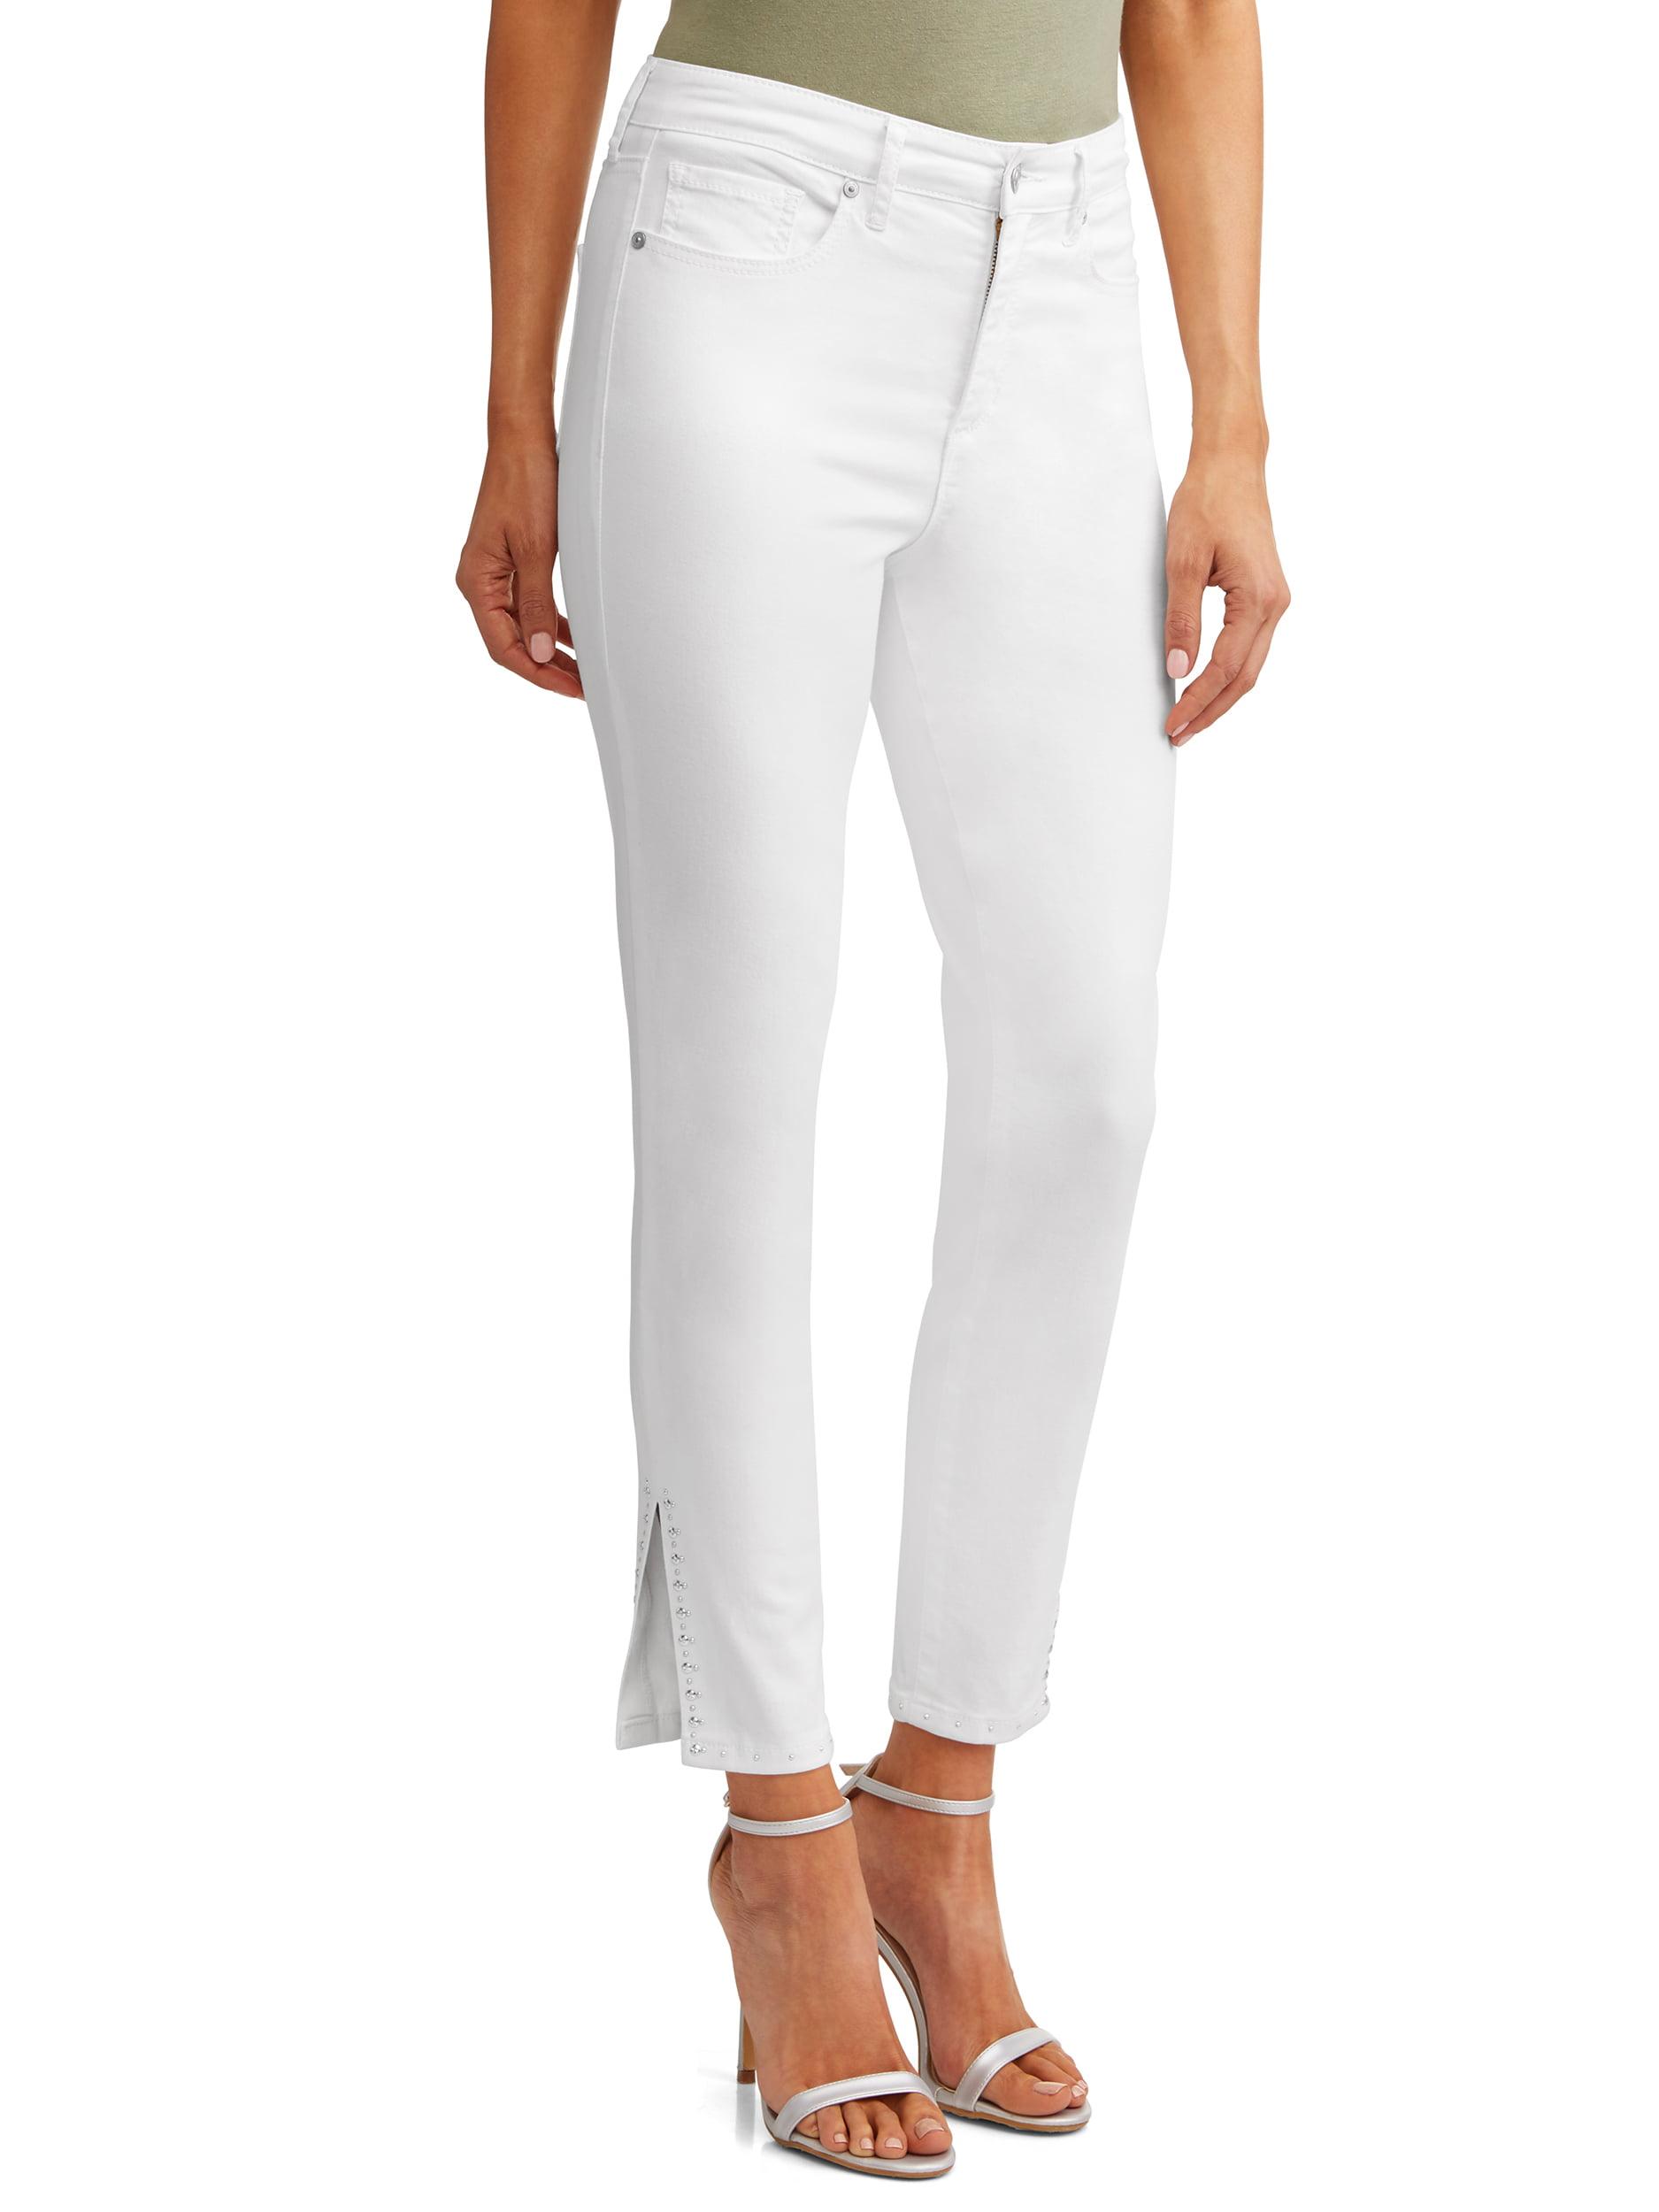 Rosa Curvy High Waist Studded Slit Ankle Jean Women's (White)